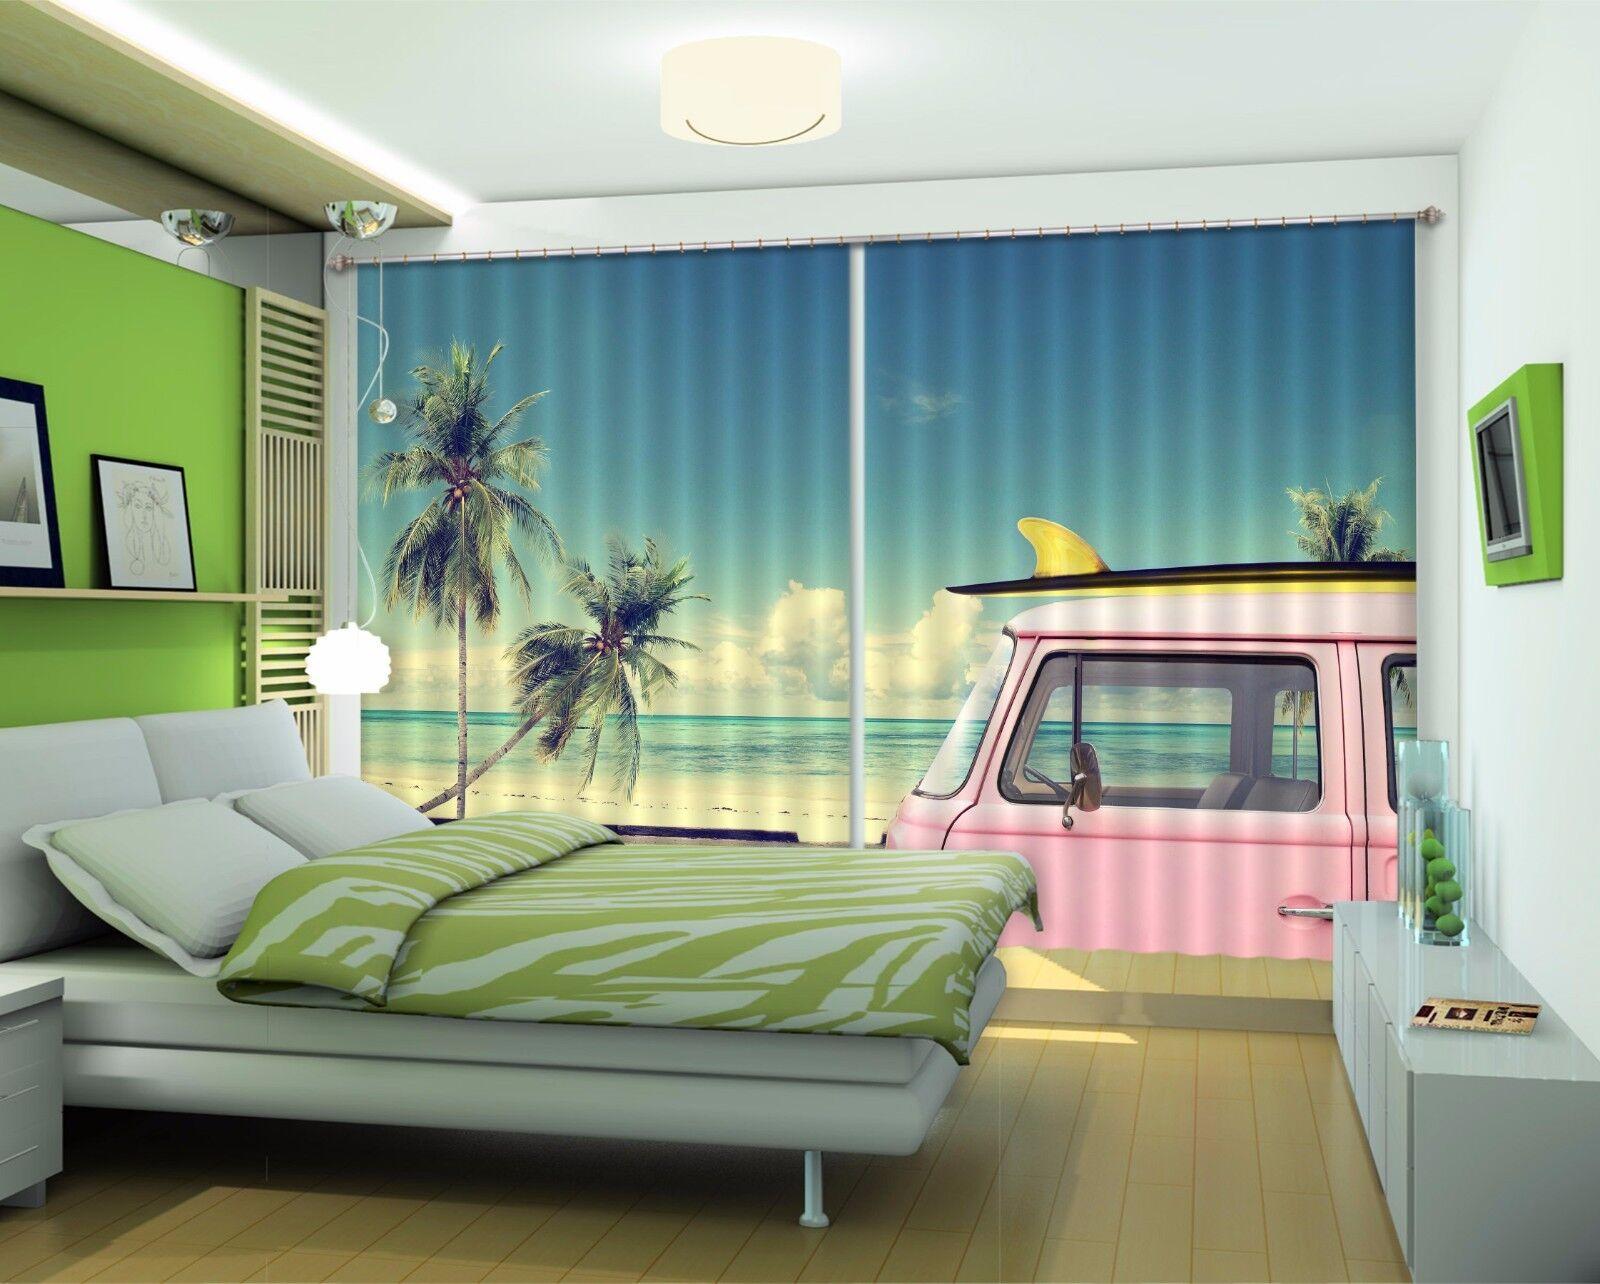 3D Coche De Mar 355 Cortinas de impresión de cortina de foto Blockout Tela Cortinas Ventana CA